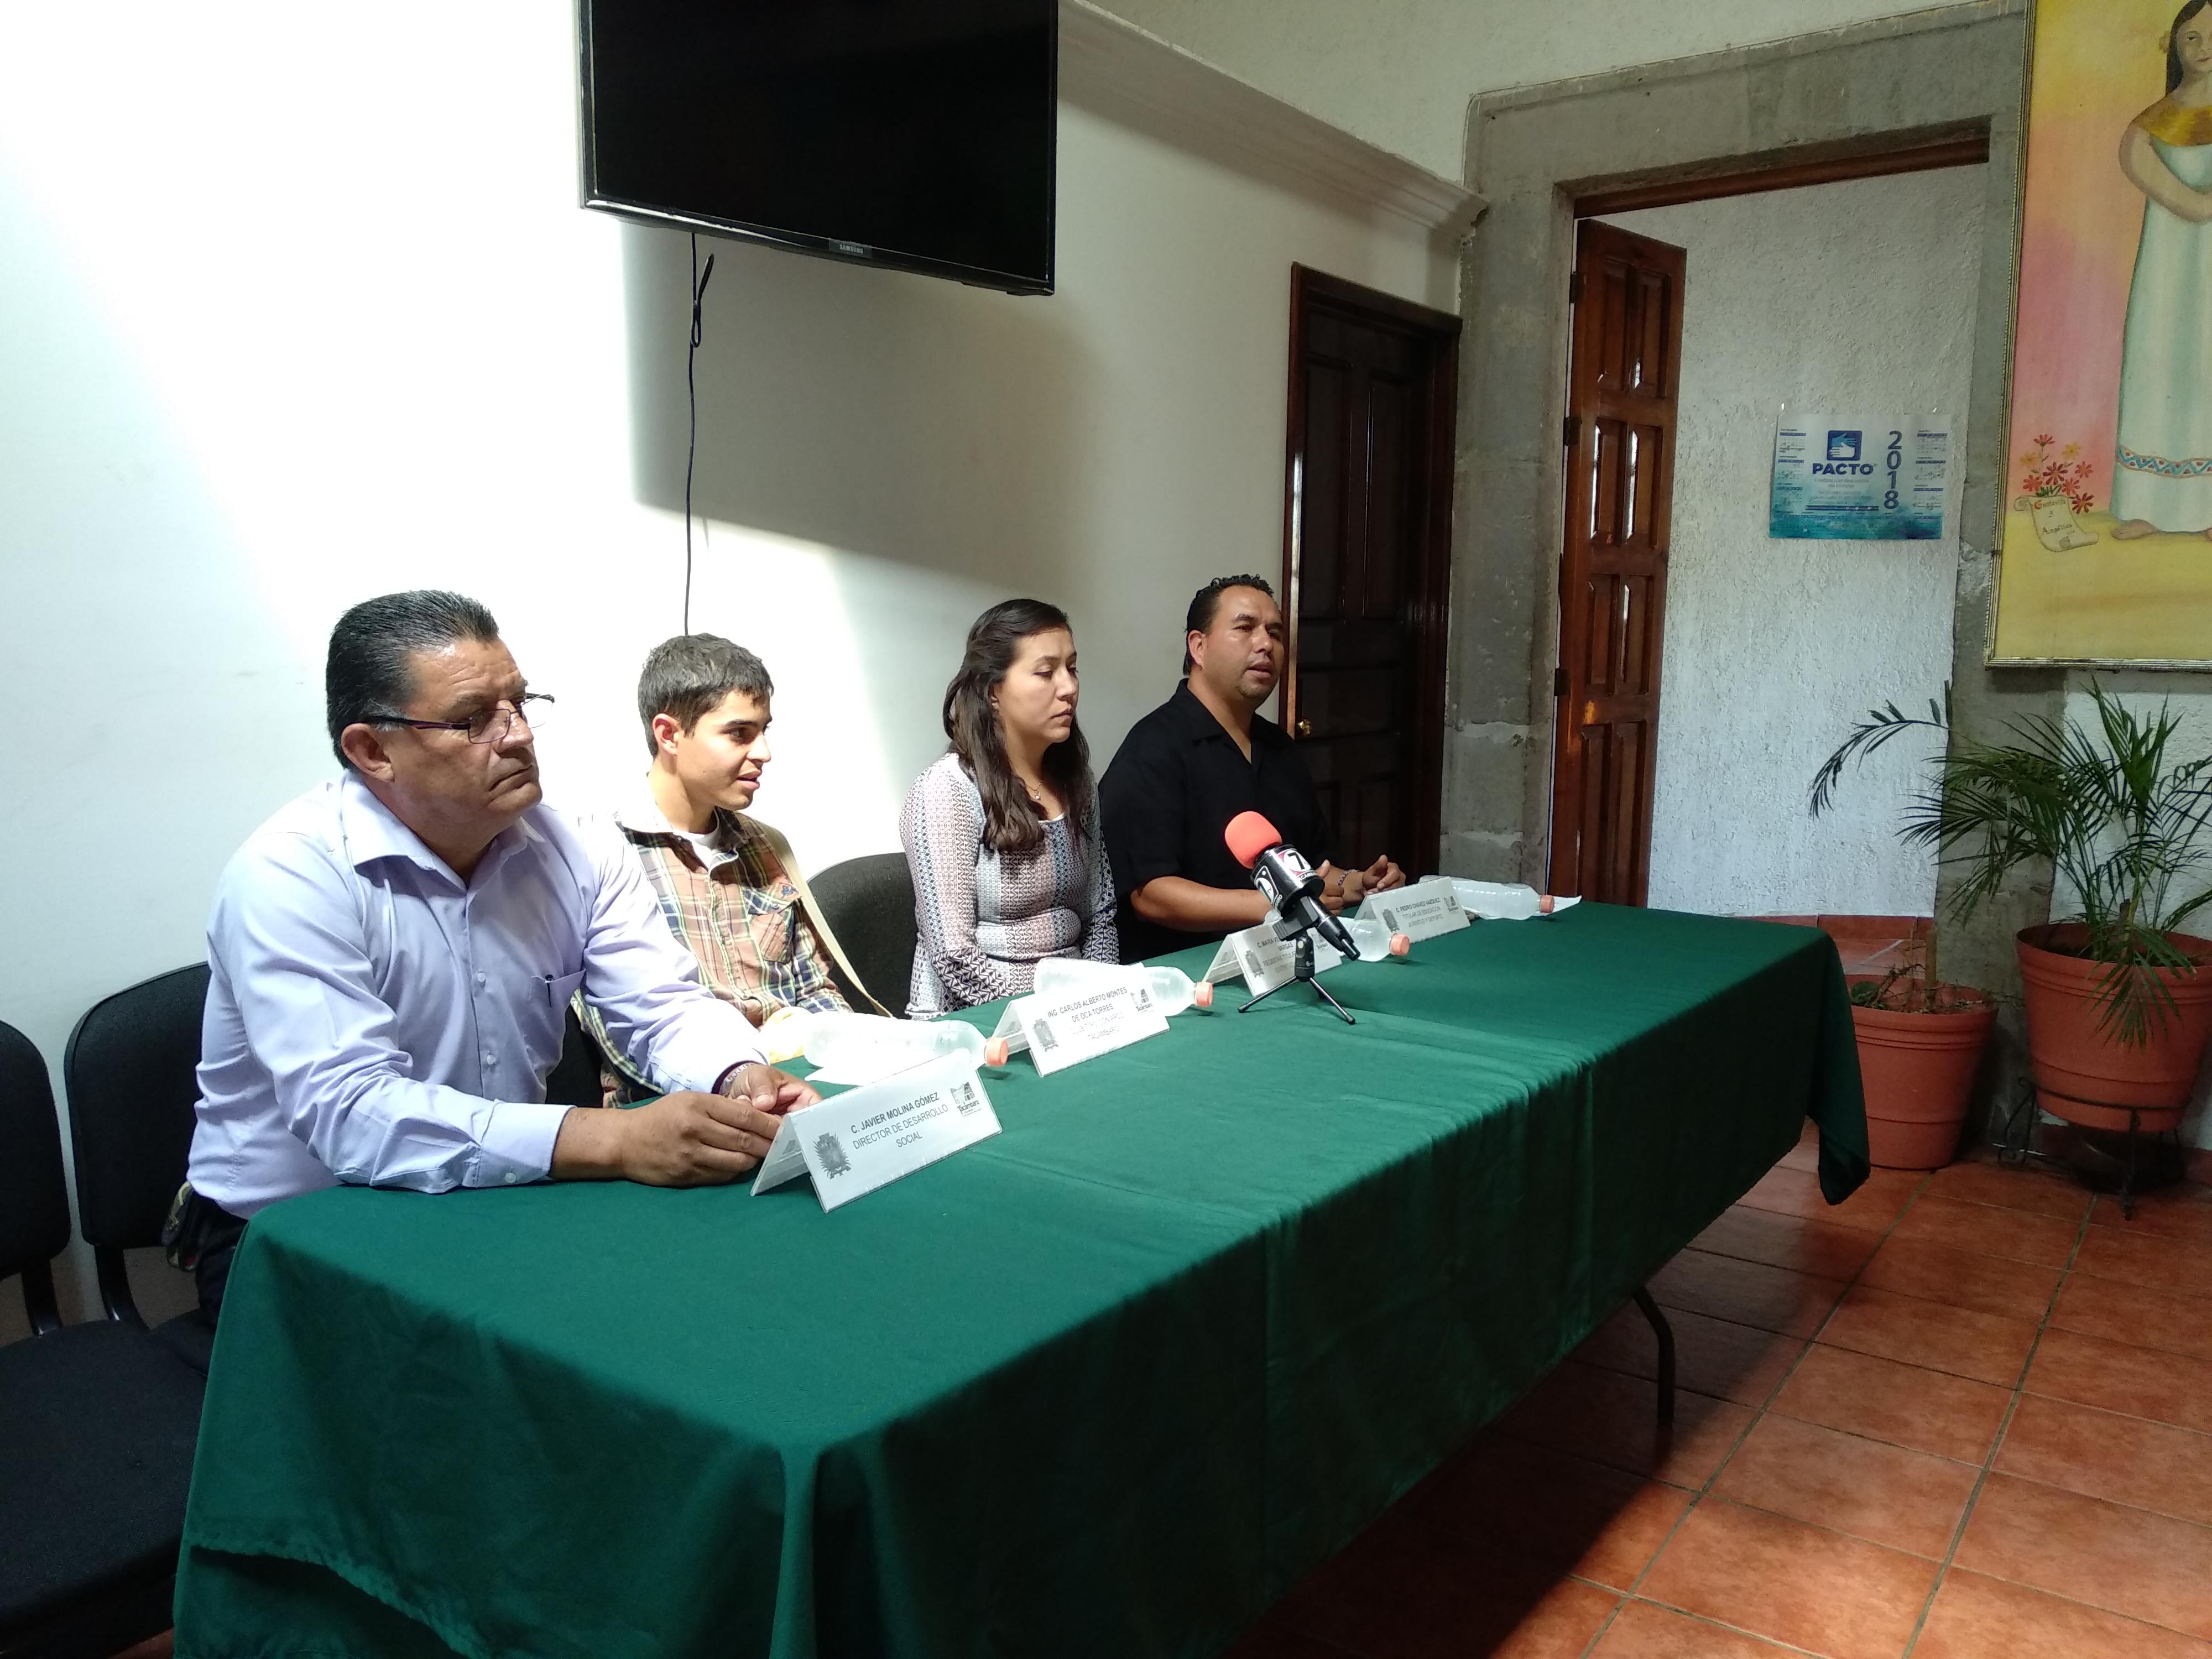 TACÁMBARO SERÁ SEDE DE LA FINAL ESTATAL DE TIRO CON ARCO.